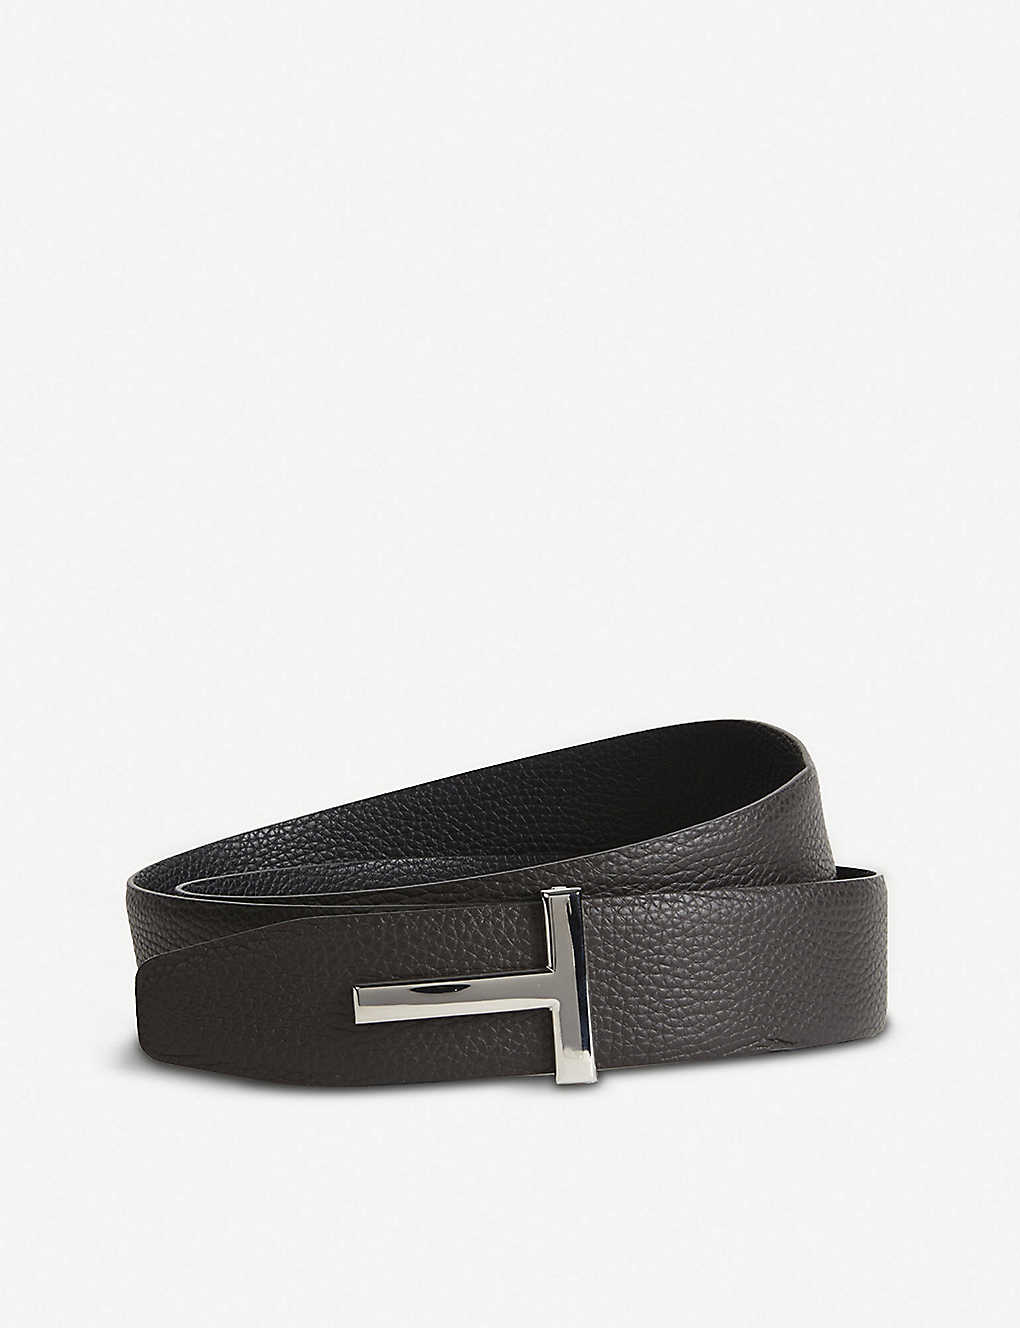 bef72f84054 TOM FORD - Reversible T logo leather belt